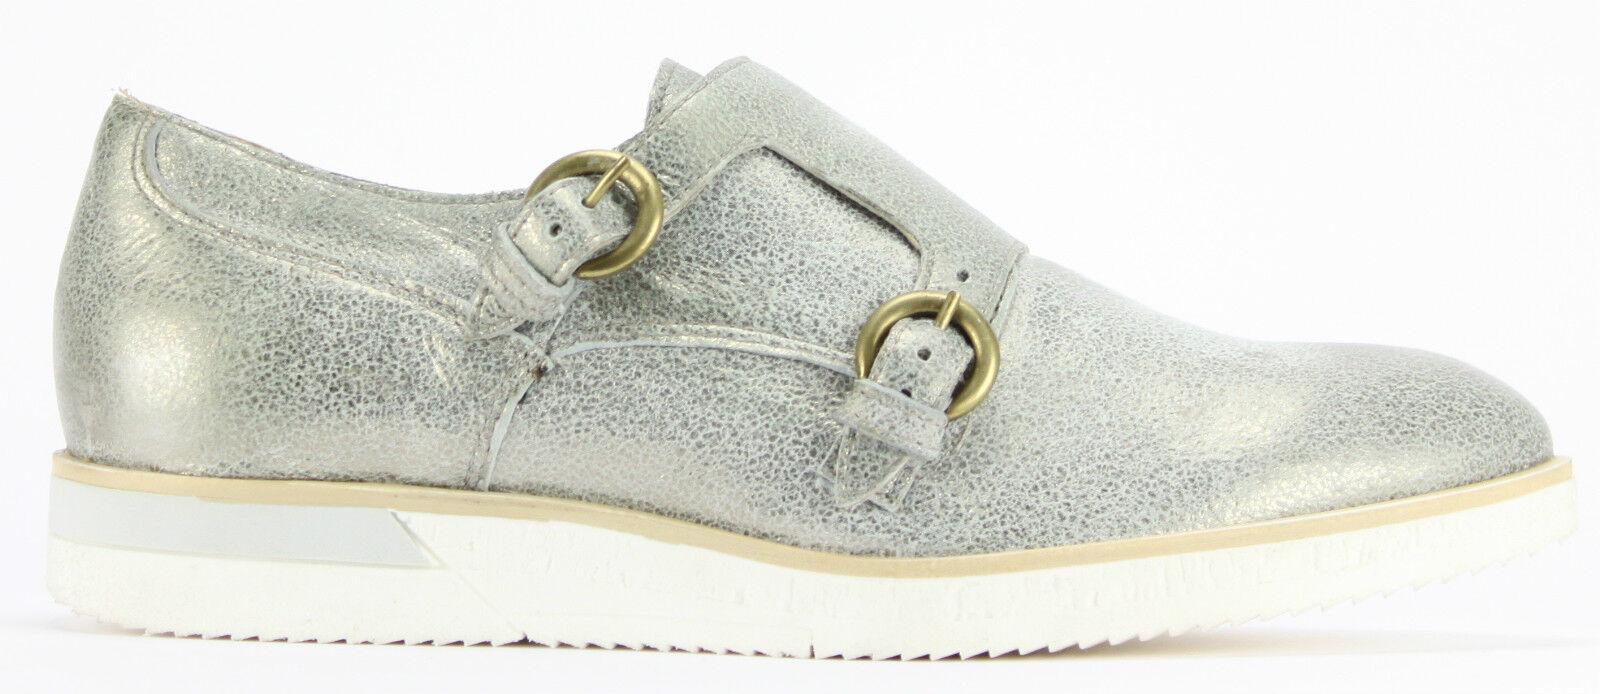 MJUS Schuhe Slipper CROISSBNT 165103 corda silver metallic Echtleder UVP 119,90